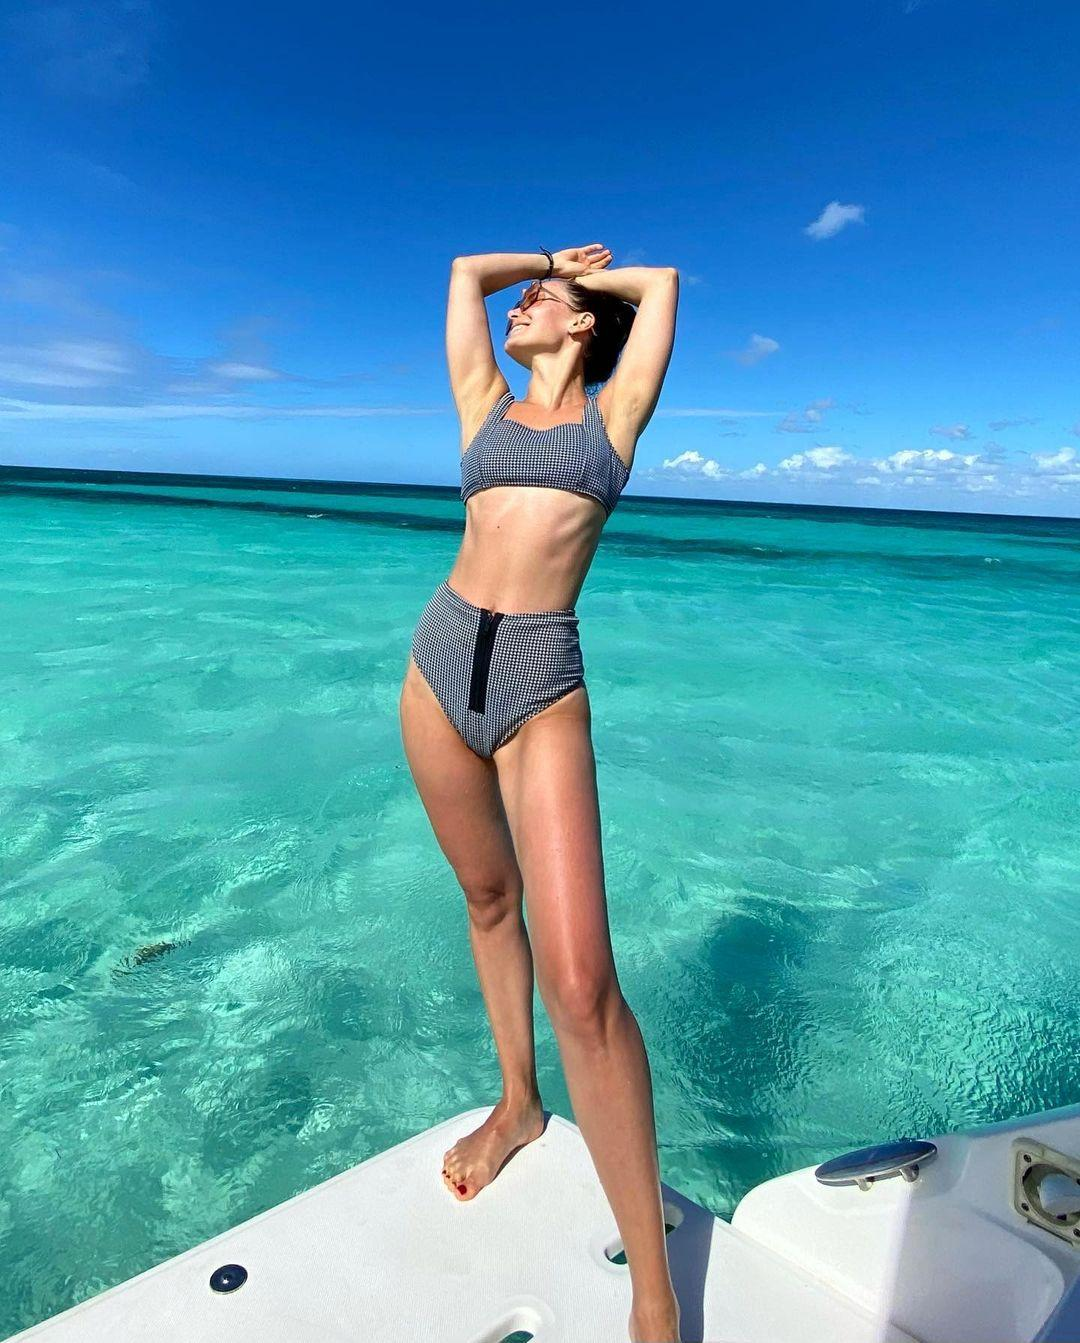 Mishina showed the figure / instagram.com/misha.k.ua